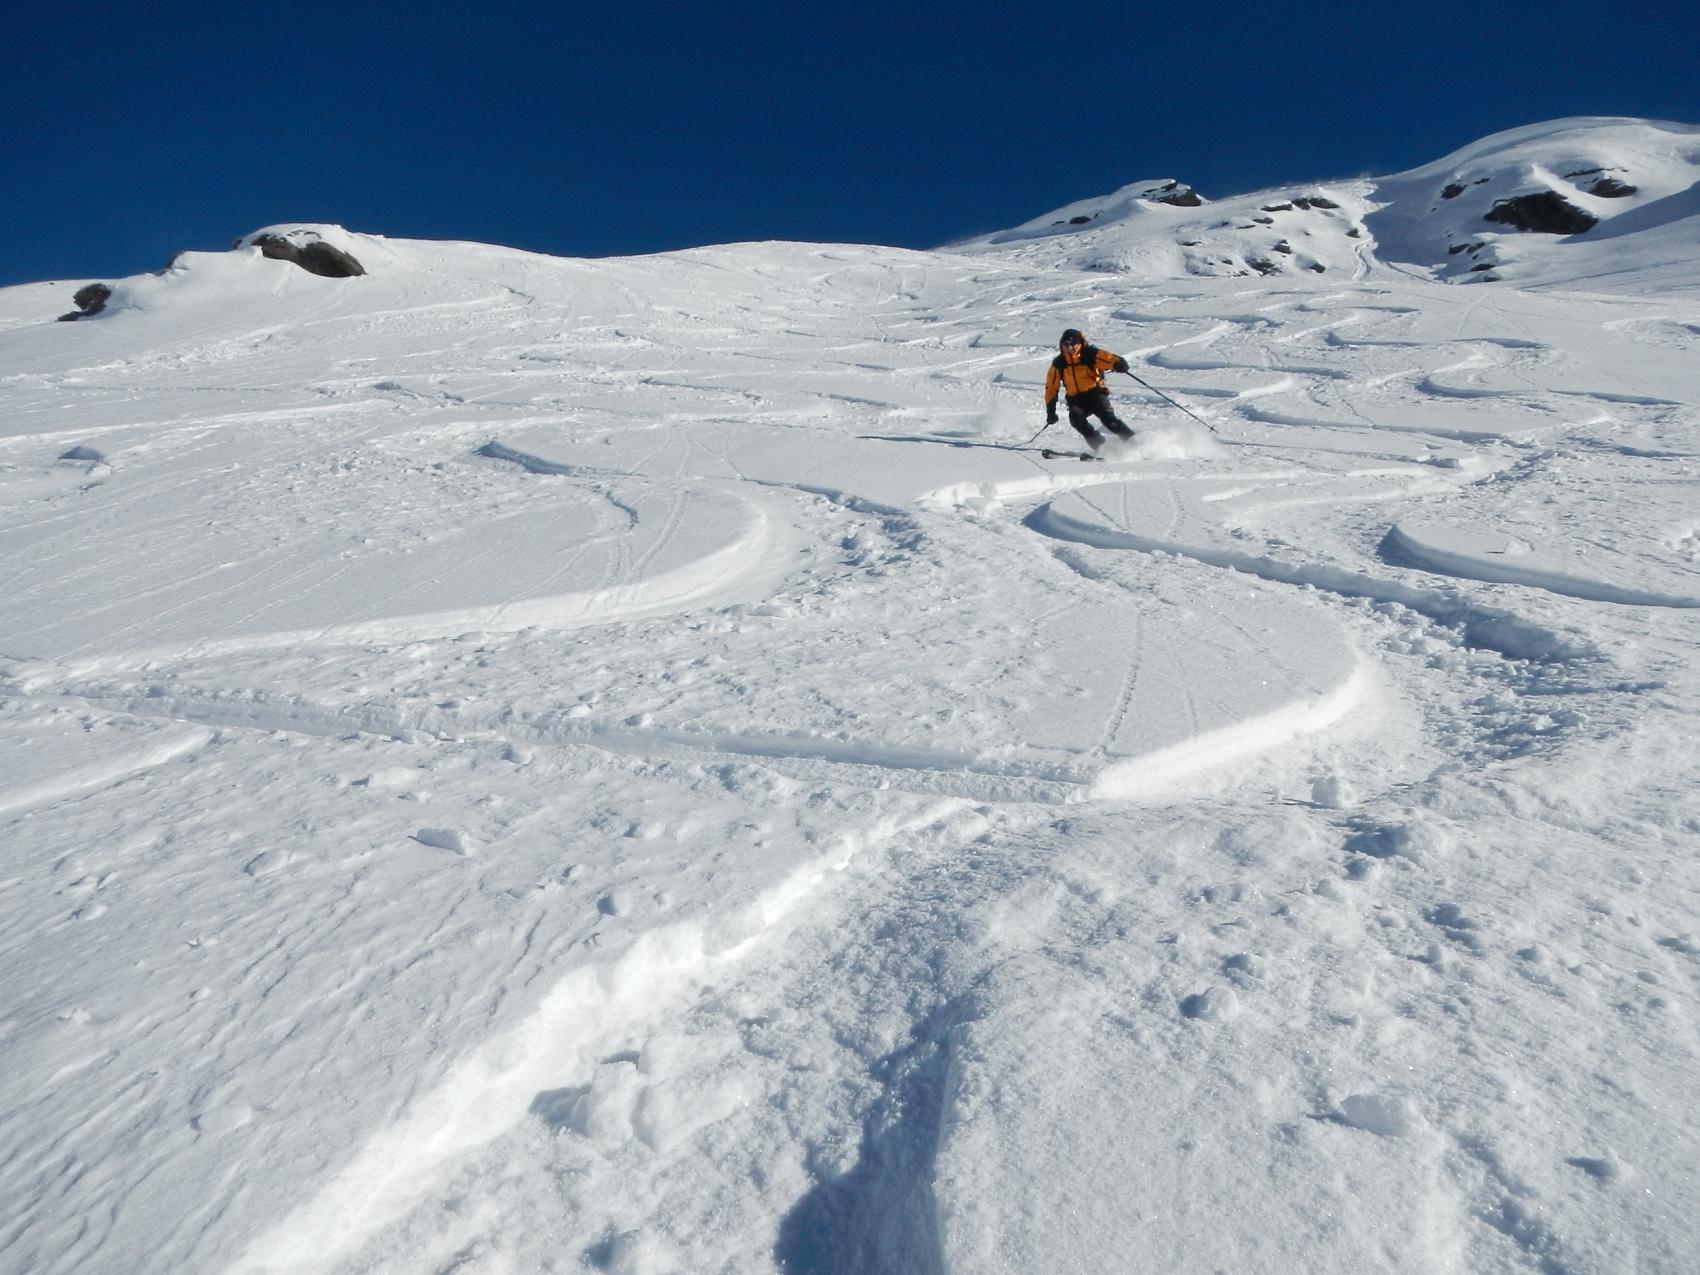 Trécare (Becca), spalla Ovest 2852 m da Cheneil 2014-12-11